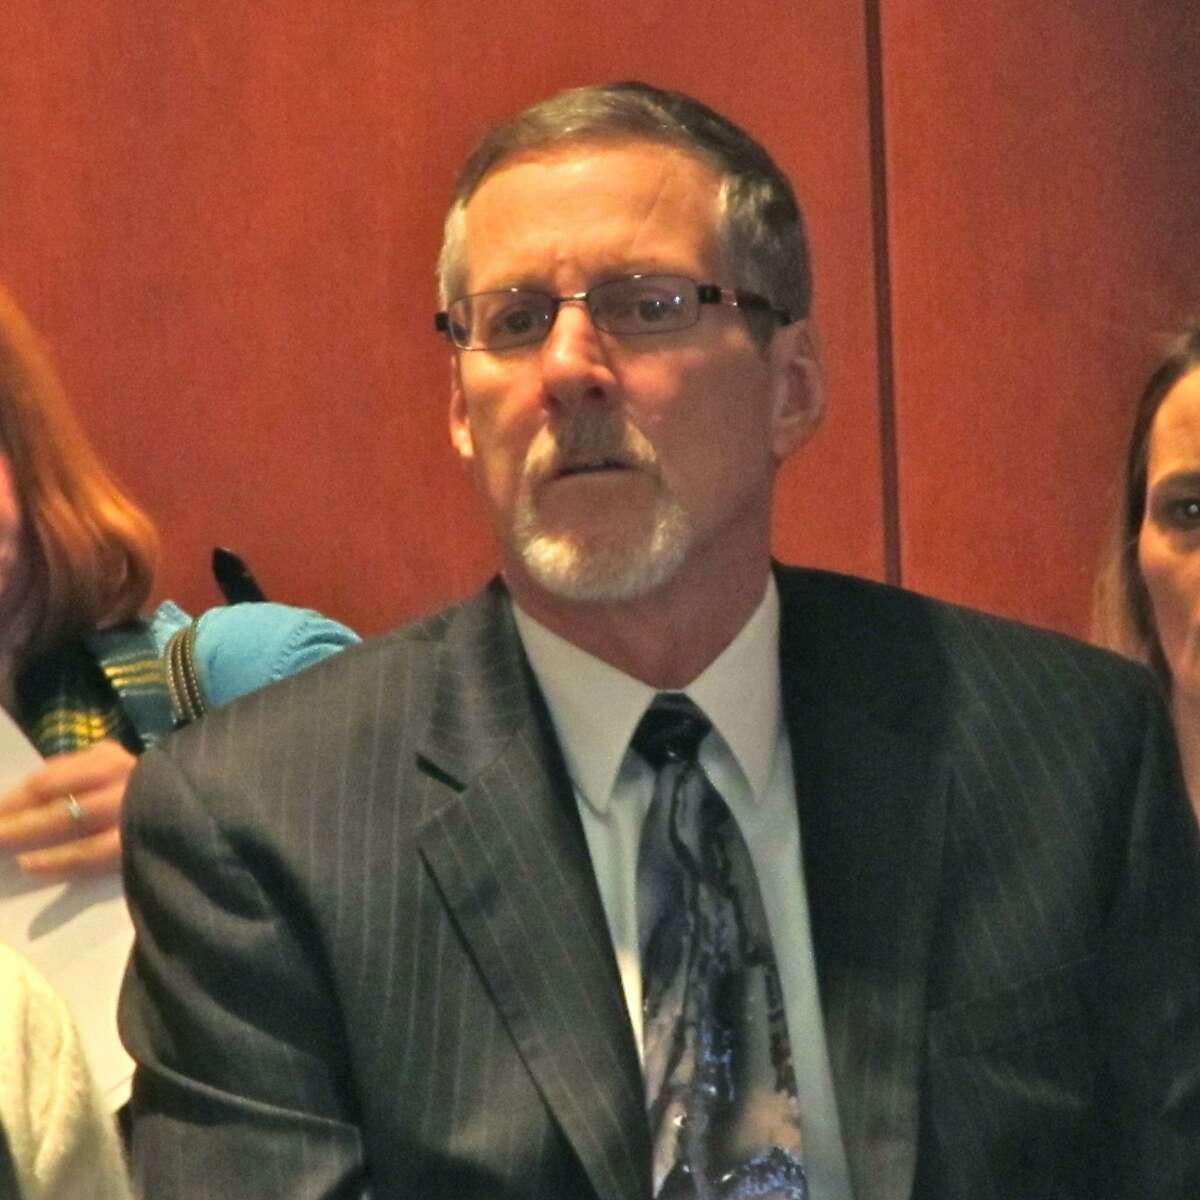 DCF's court monitor Raymond Mancuso: 'The Department will be hard pressed to address ... core needs adequately' (CTMirror.org photo)